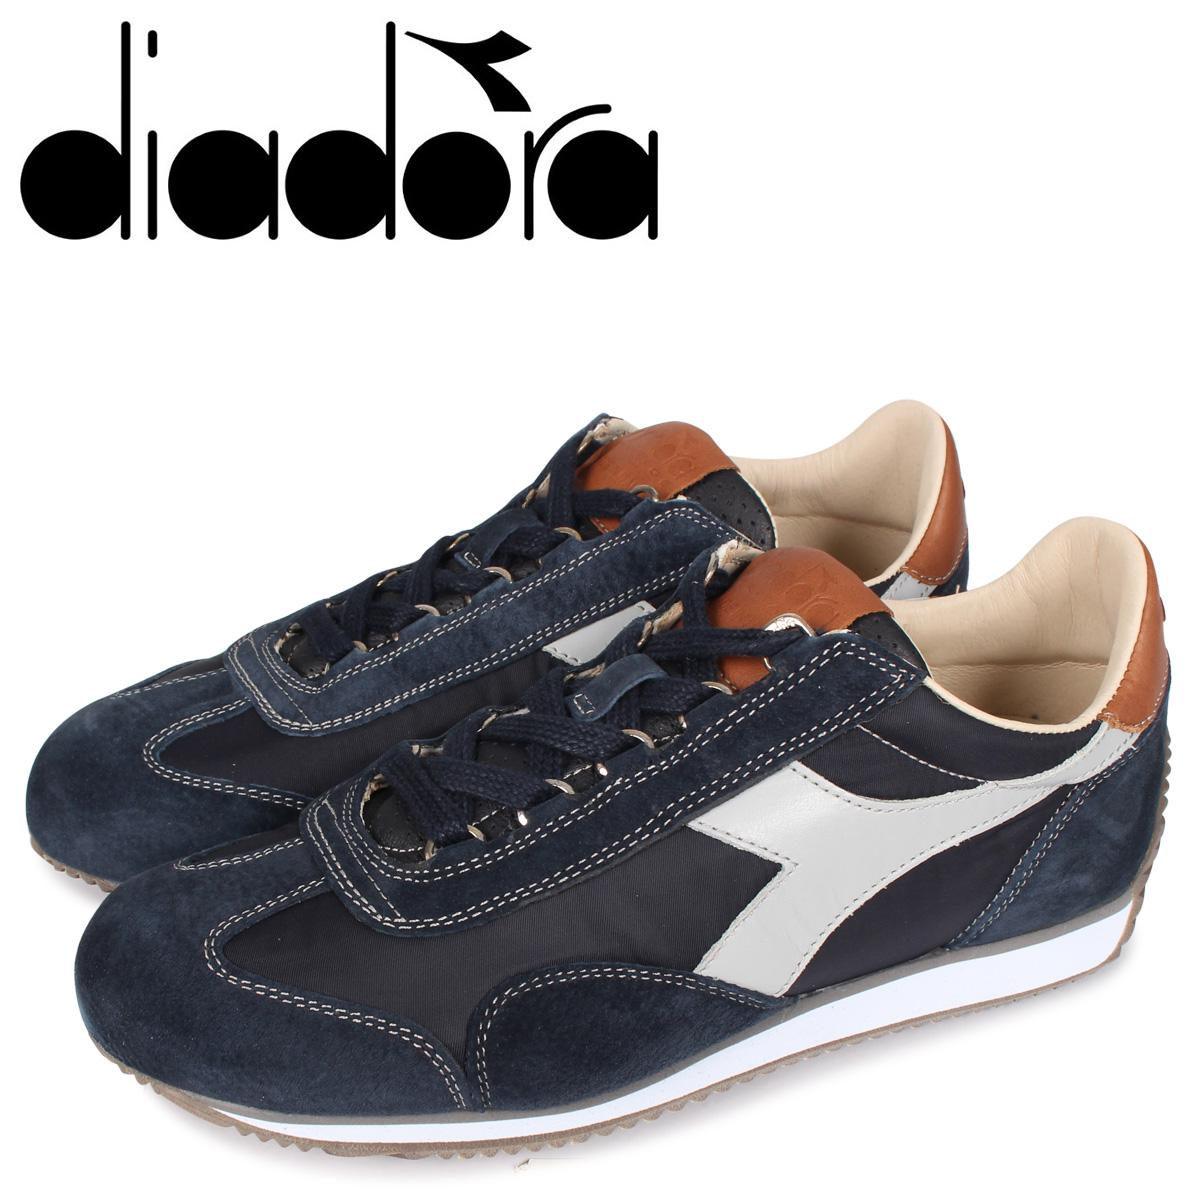 Diadora ディアドラ ヘリテージ エキップ イタリア スニーカー メンズ HERITAGE EQUIPE ITA ブラック 黒 170645-0117 [3/2 新入荷]